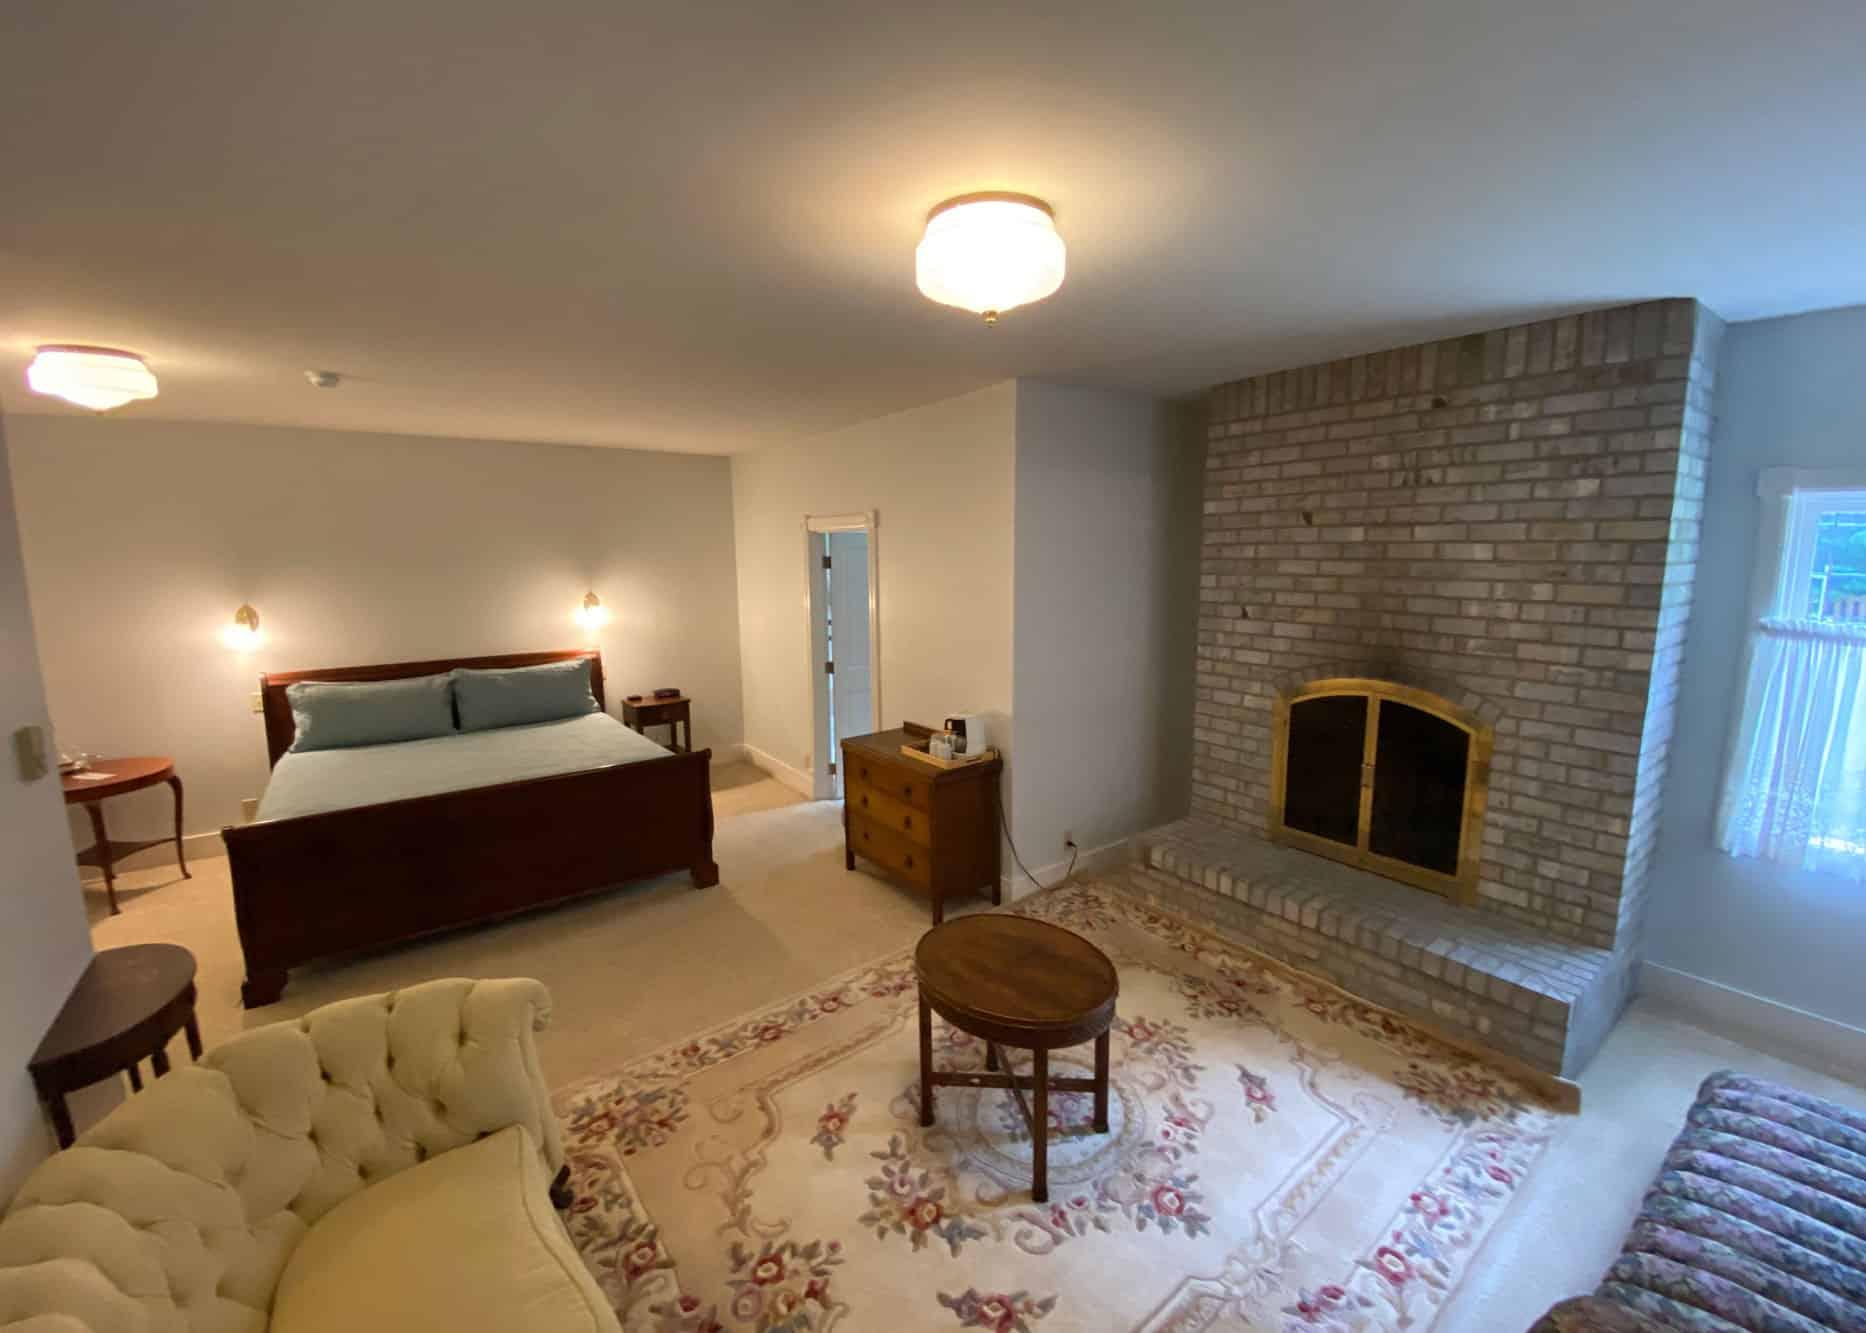 the-edenwild-inn-lopez-island-lodging-2020-room-02-03